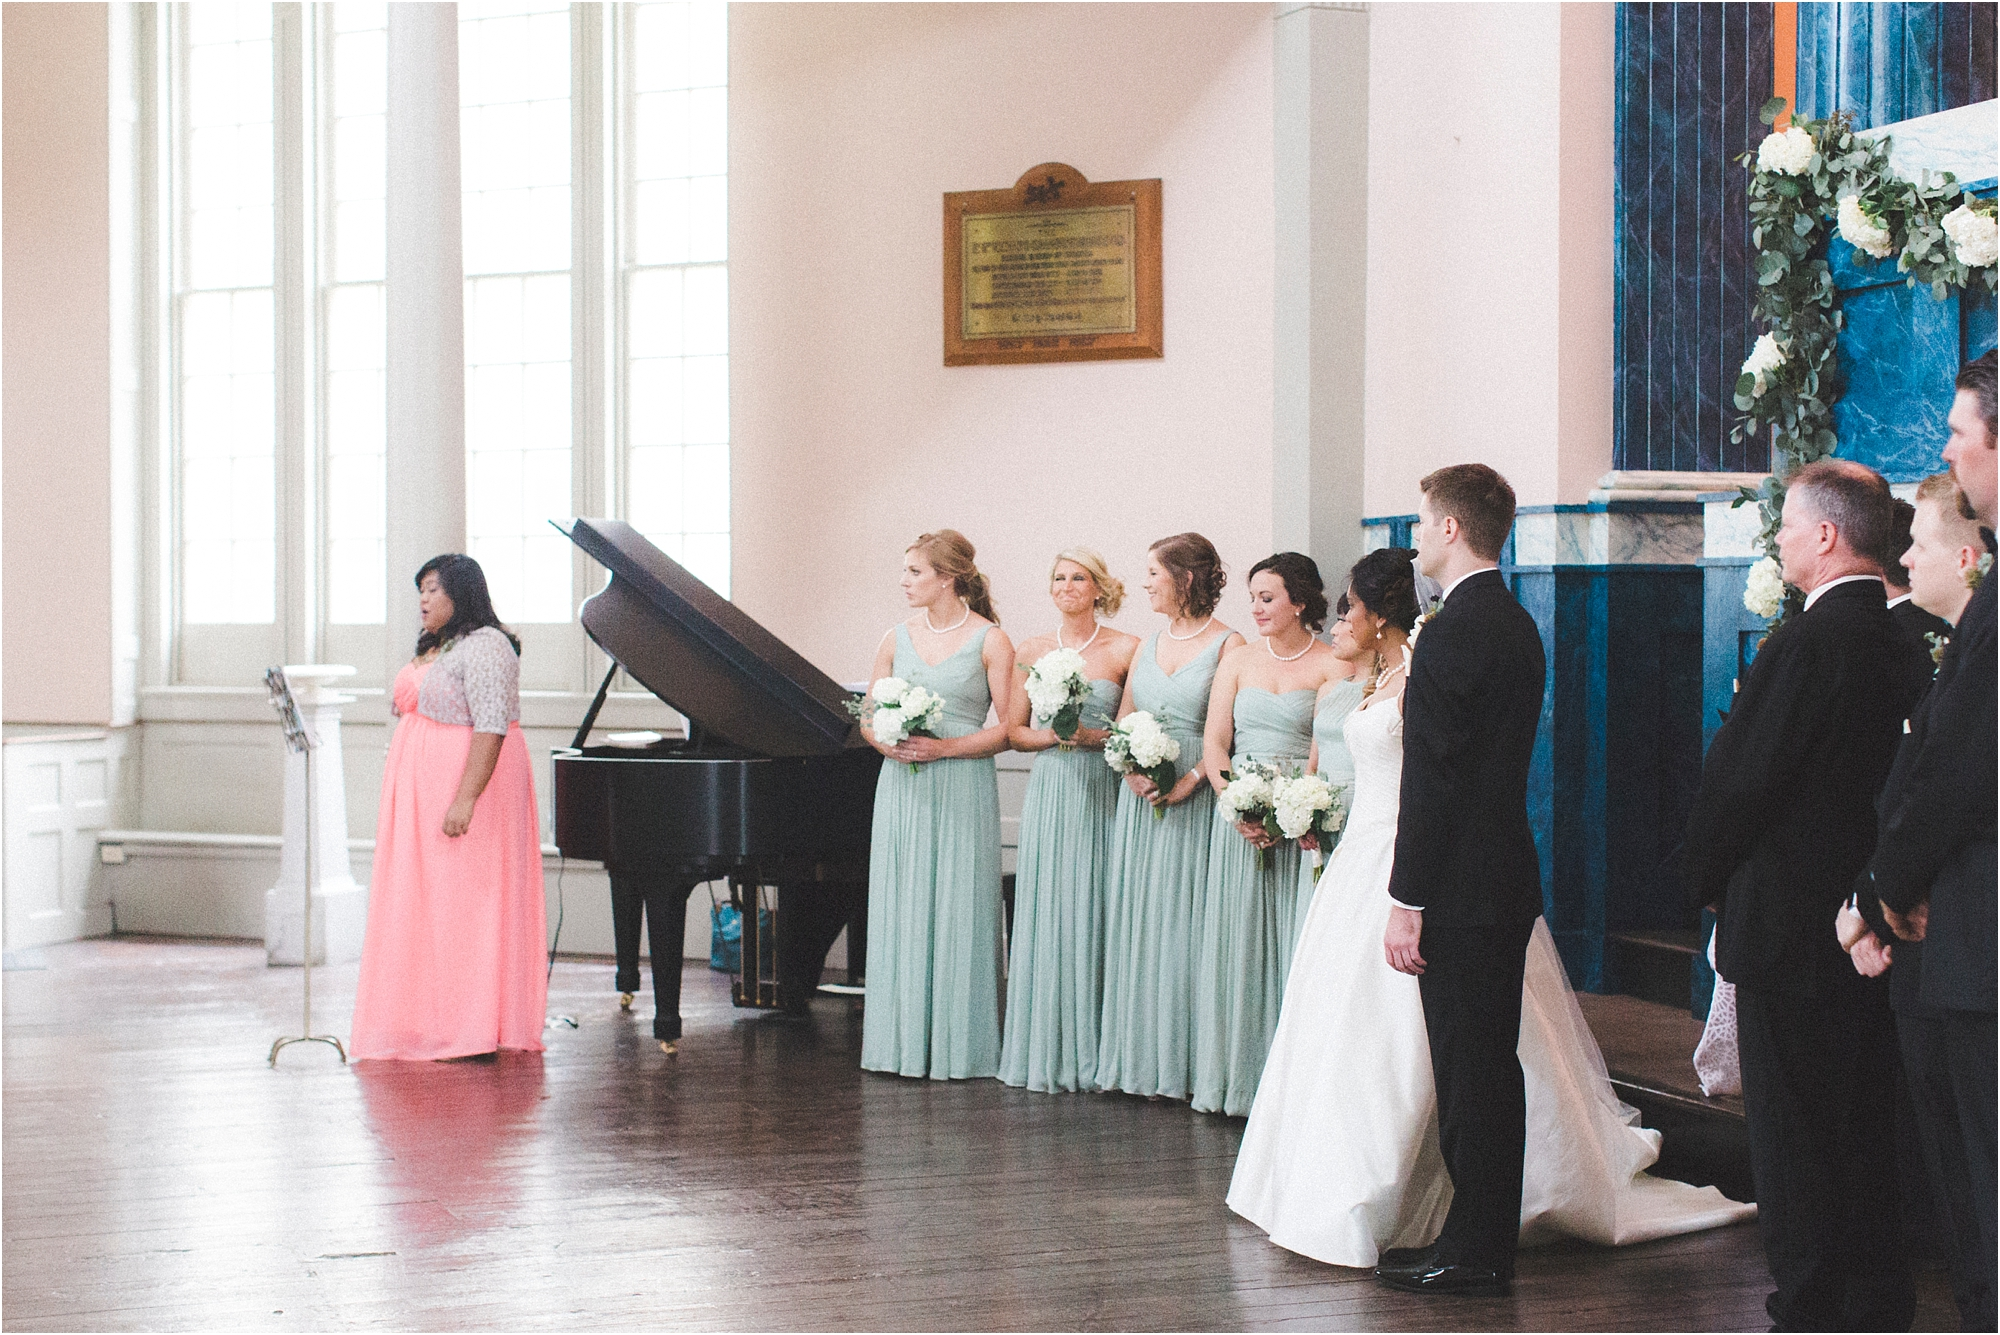 stephanie-yonce-photography-historic-church-virginia-museu-fine-arts-wedding-photos_043.JPG